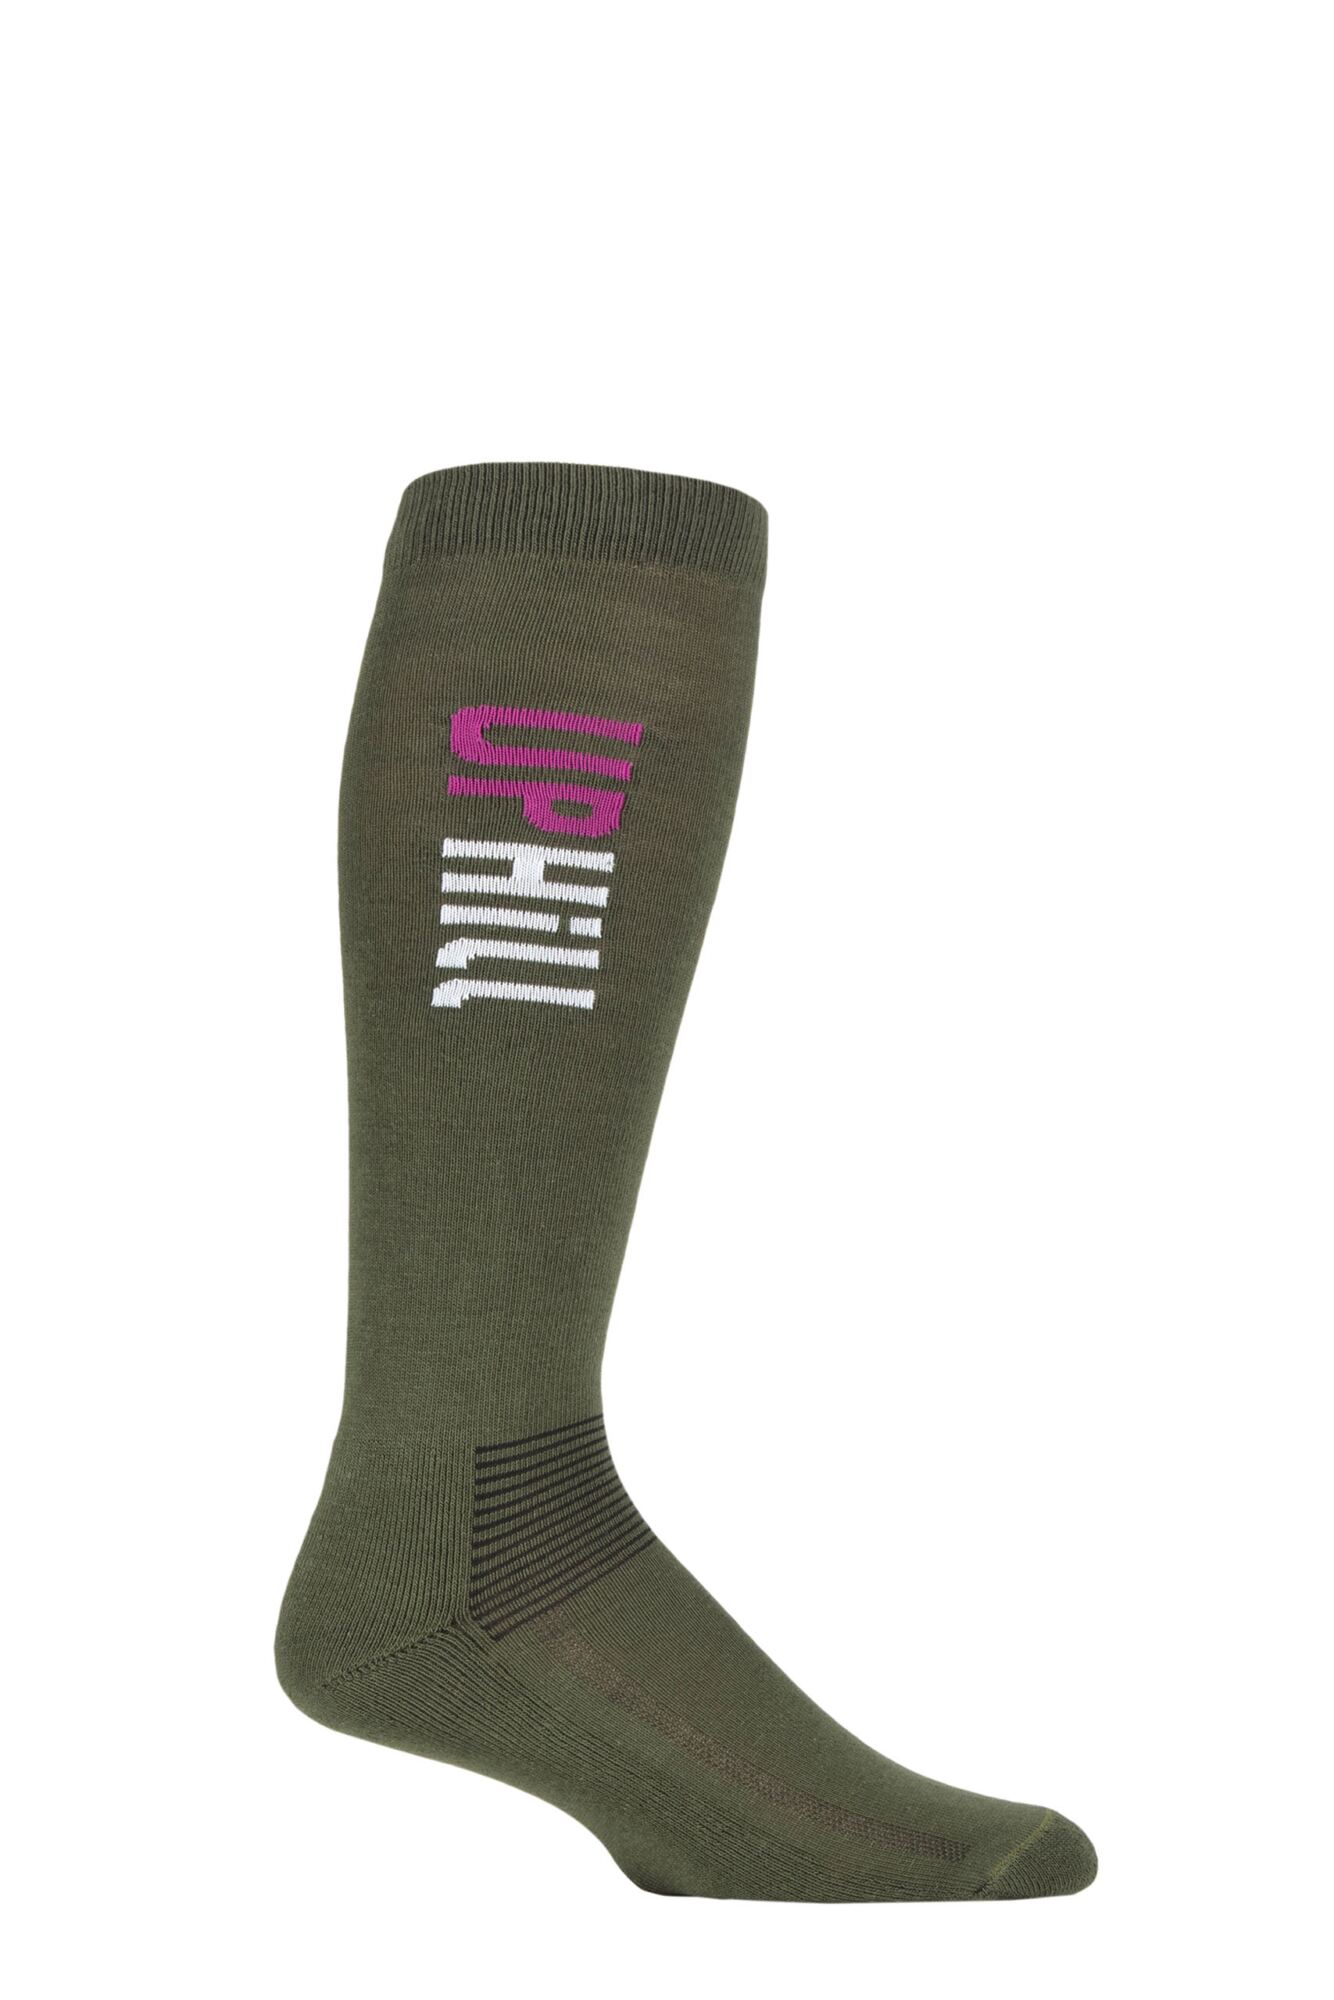 UpHillSport 1 Pair Organic Cotton Equestrian Socks